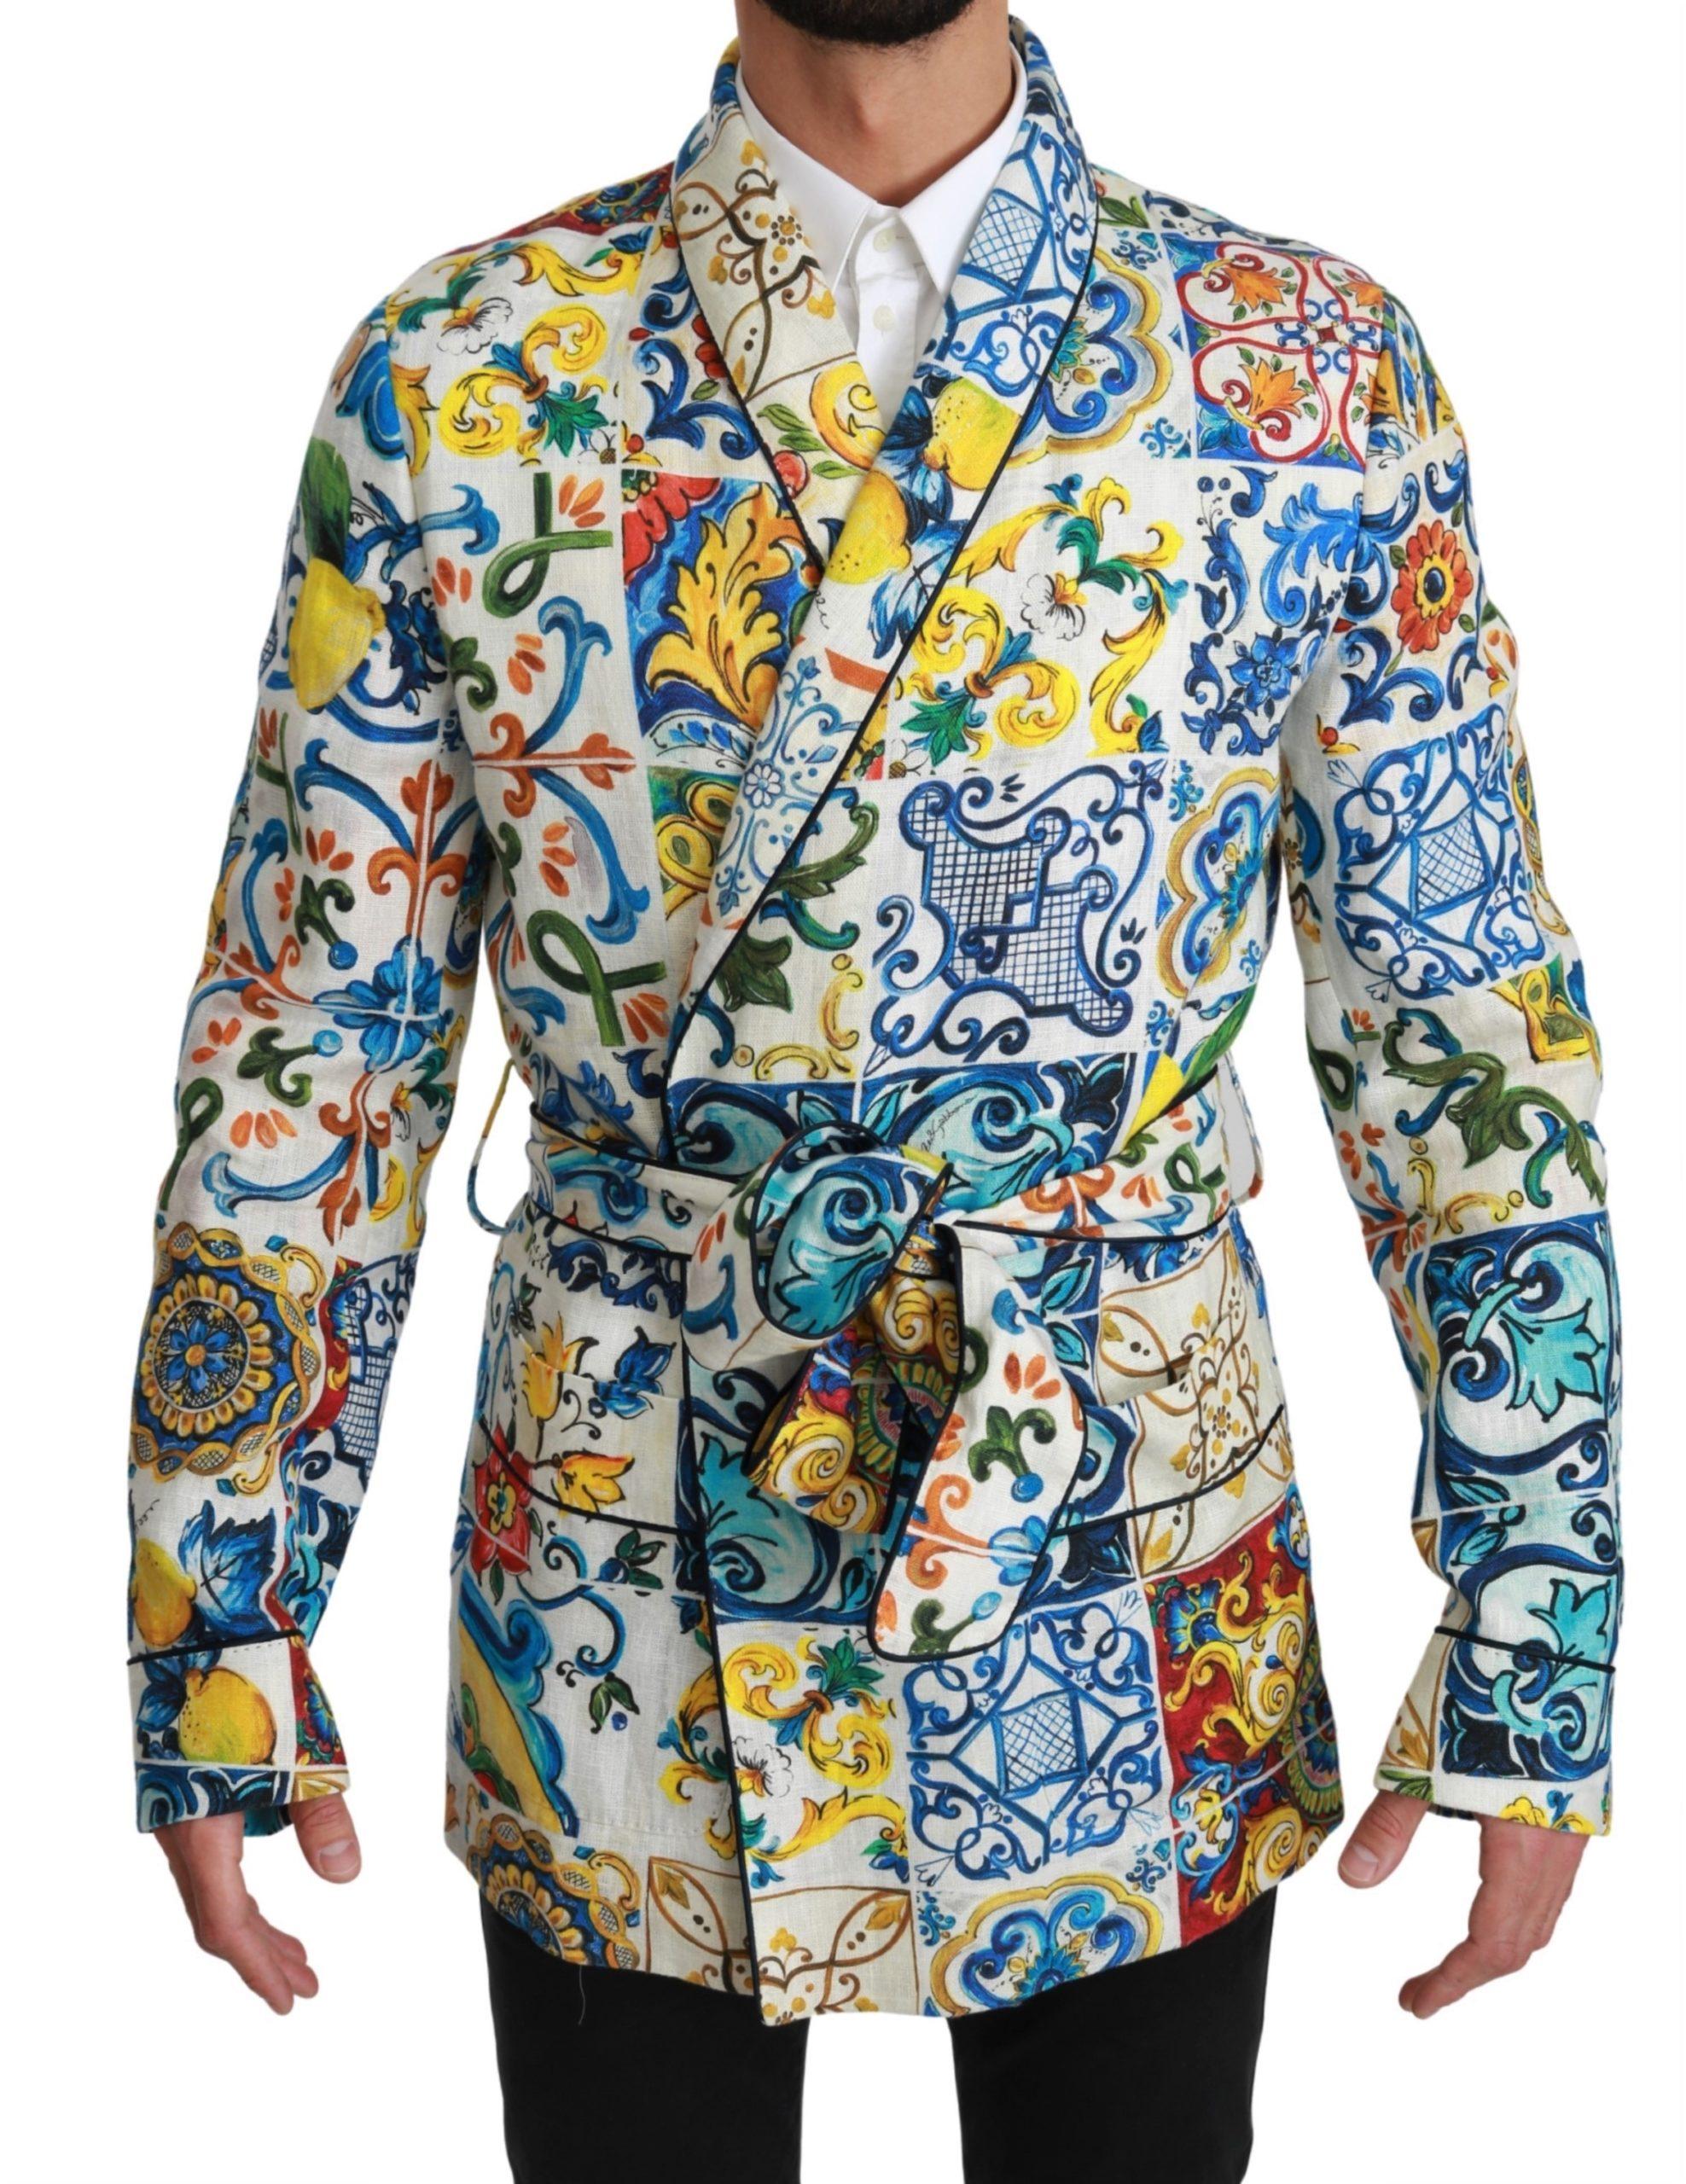 Dolce & Gabbana Men's Brocade Linen Robe Jacket Multicolor JKT2598 - IT46   S